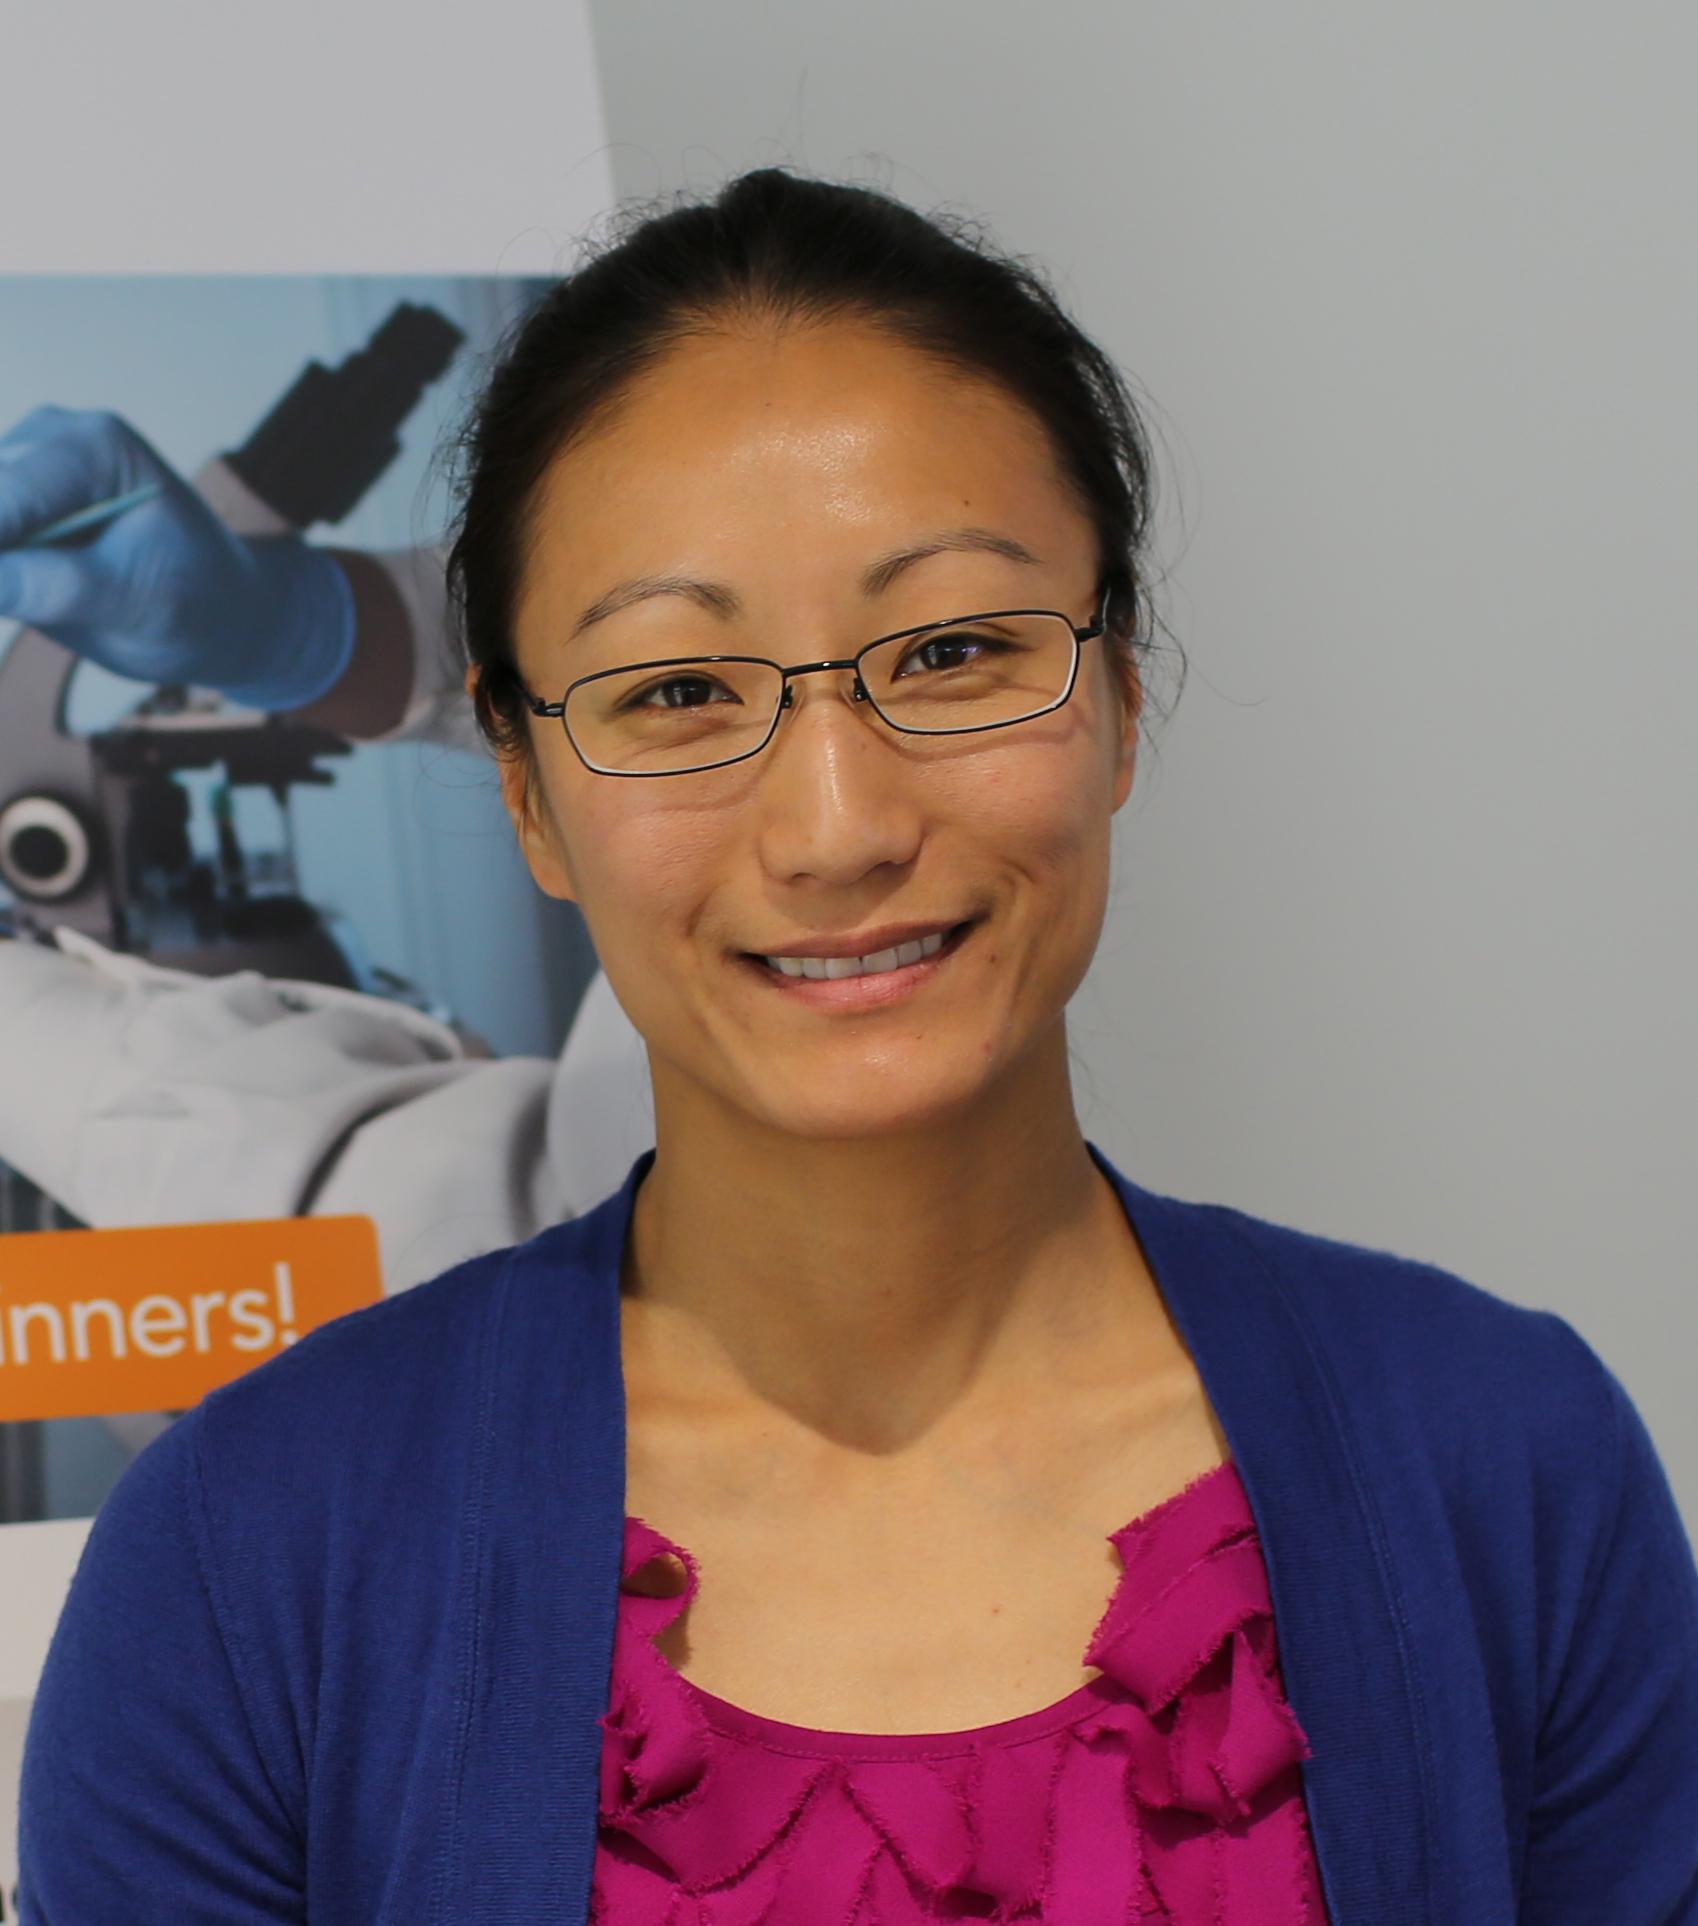 Catherine Chen, Ph.D.